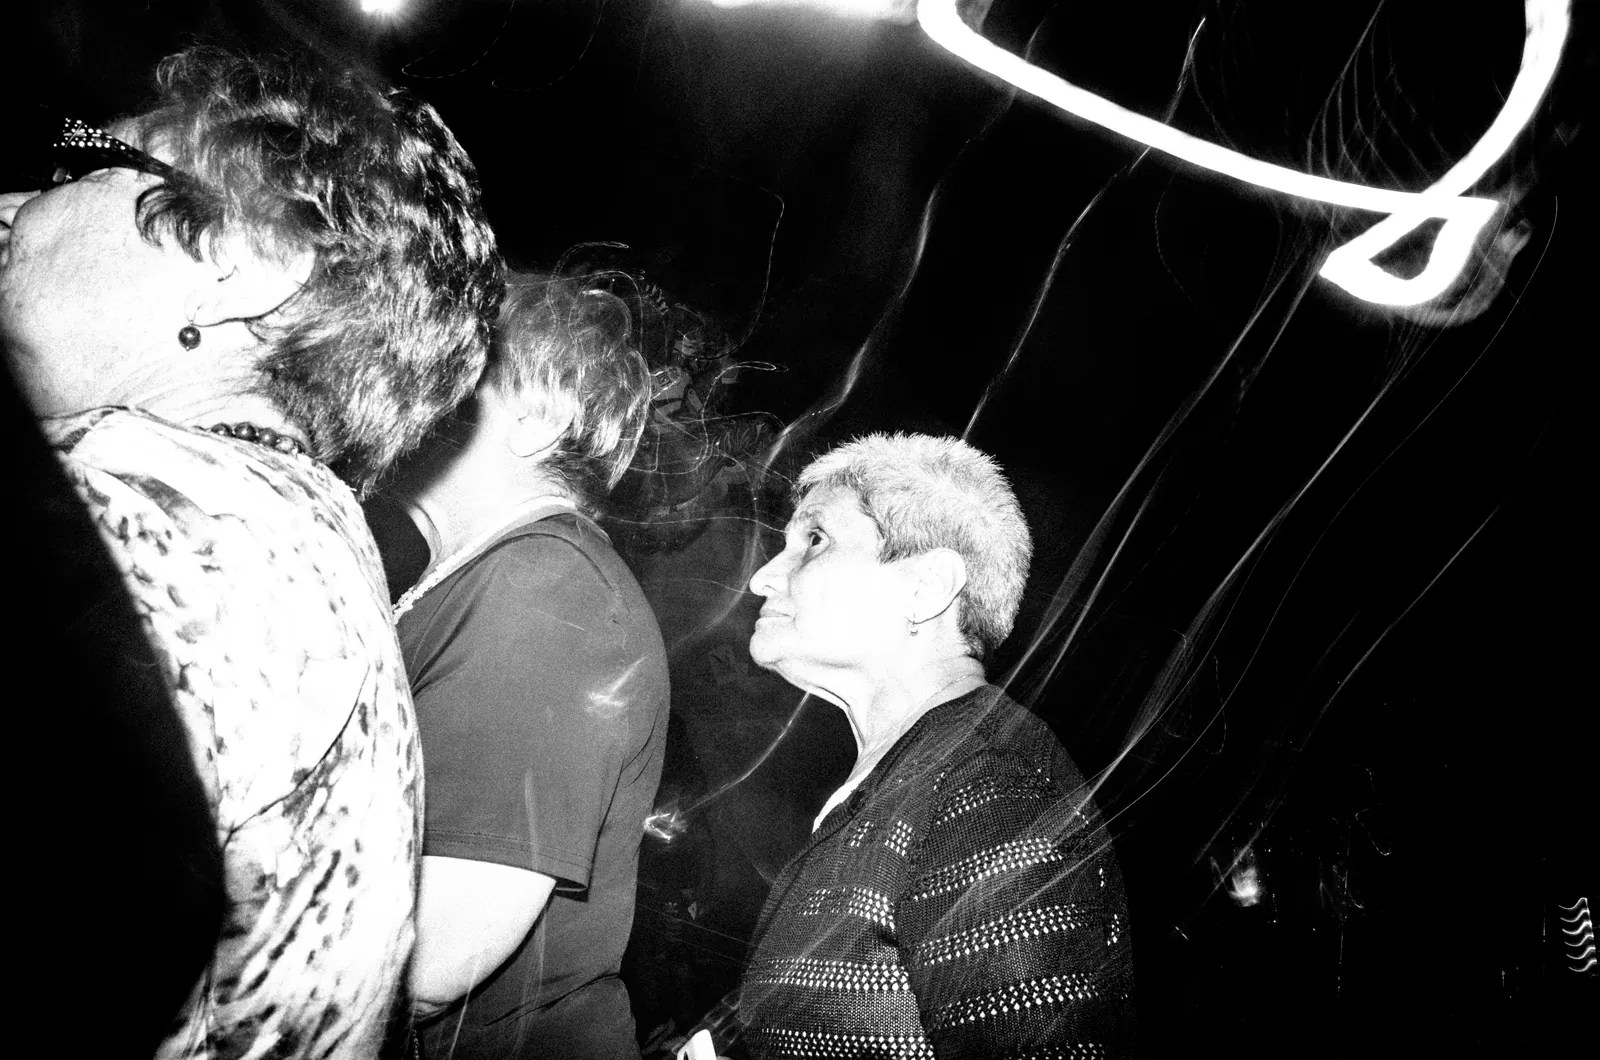 R0020012 - Una Istintiva Sessione Notturna • Street Photography Night Session a Palagonia - Sicilia - fotostreet.it